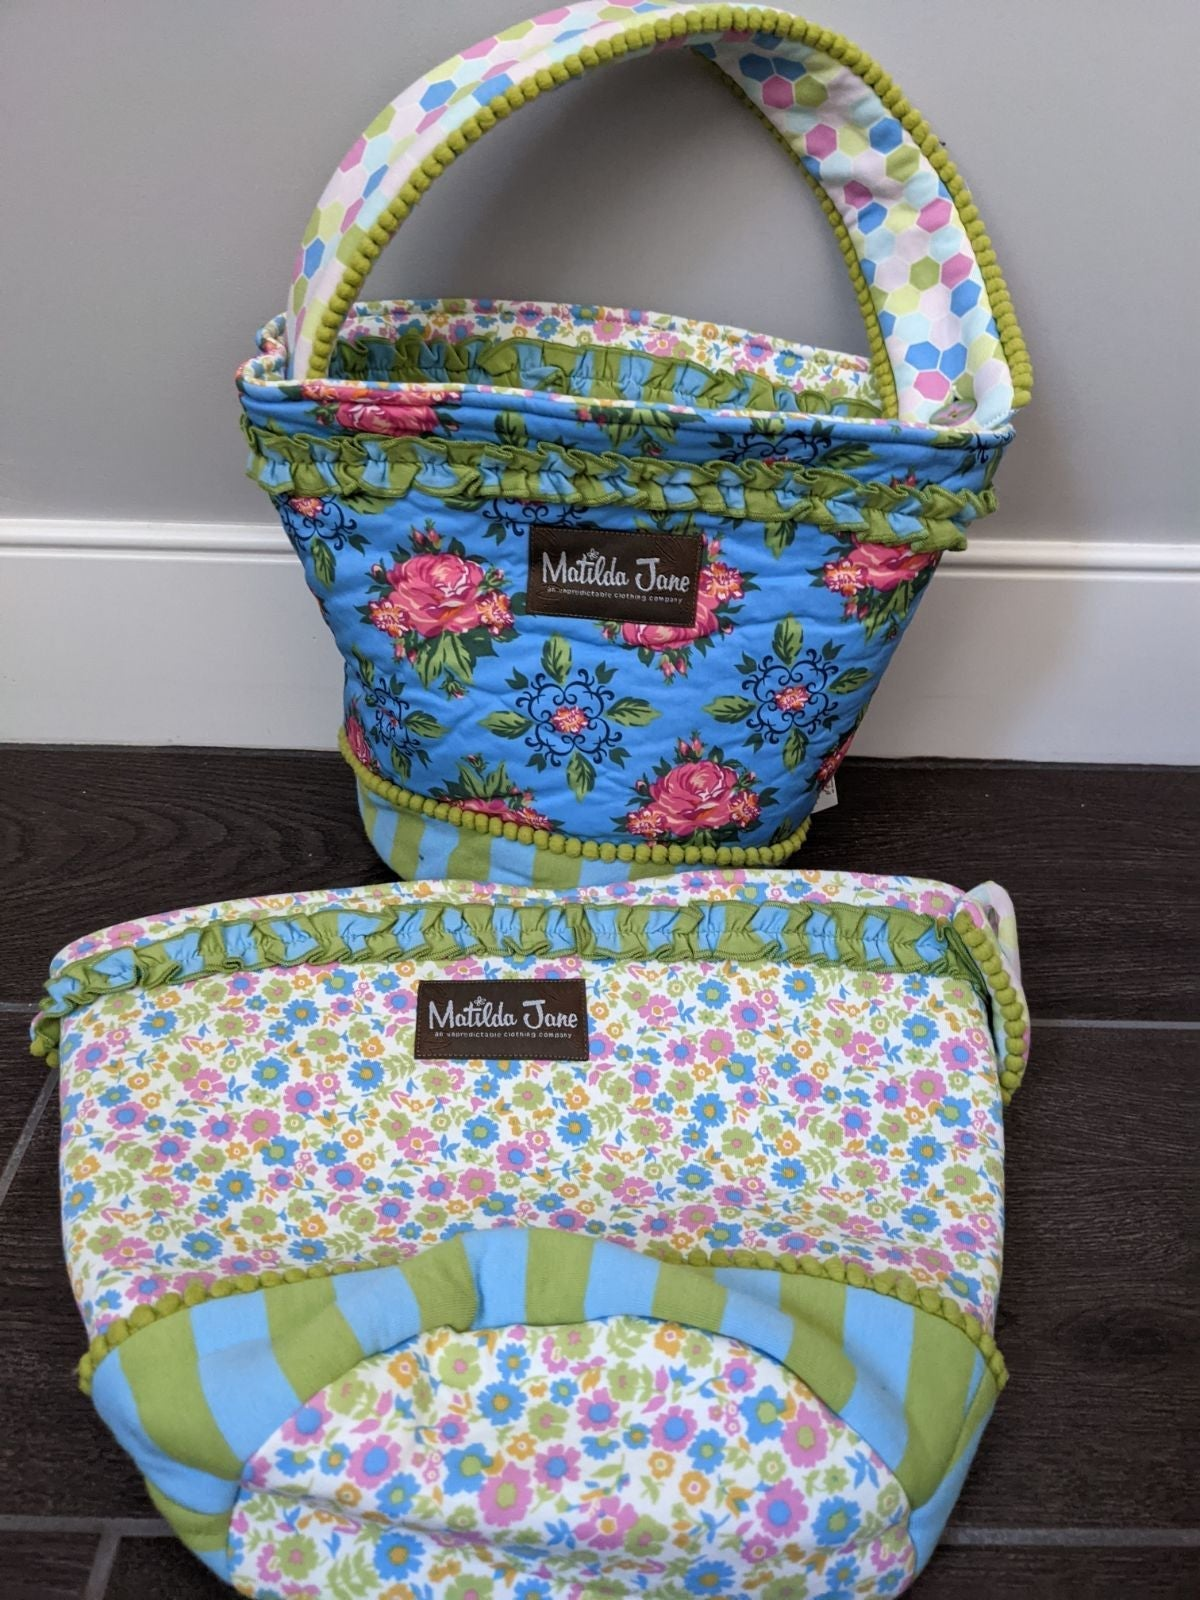 Matilda Jane cloth baskets